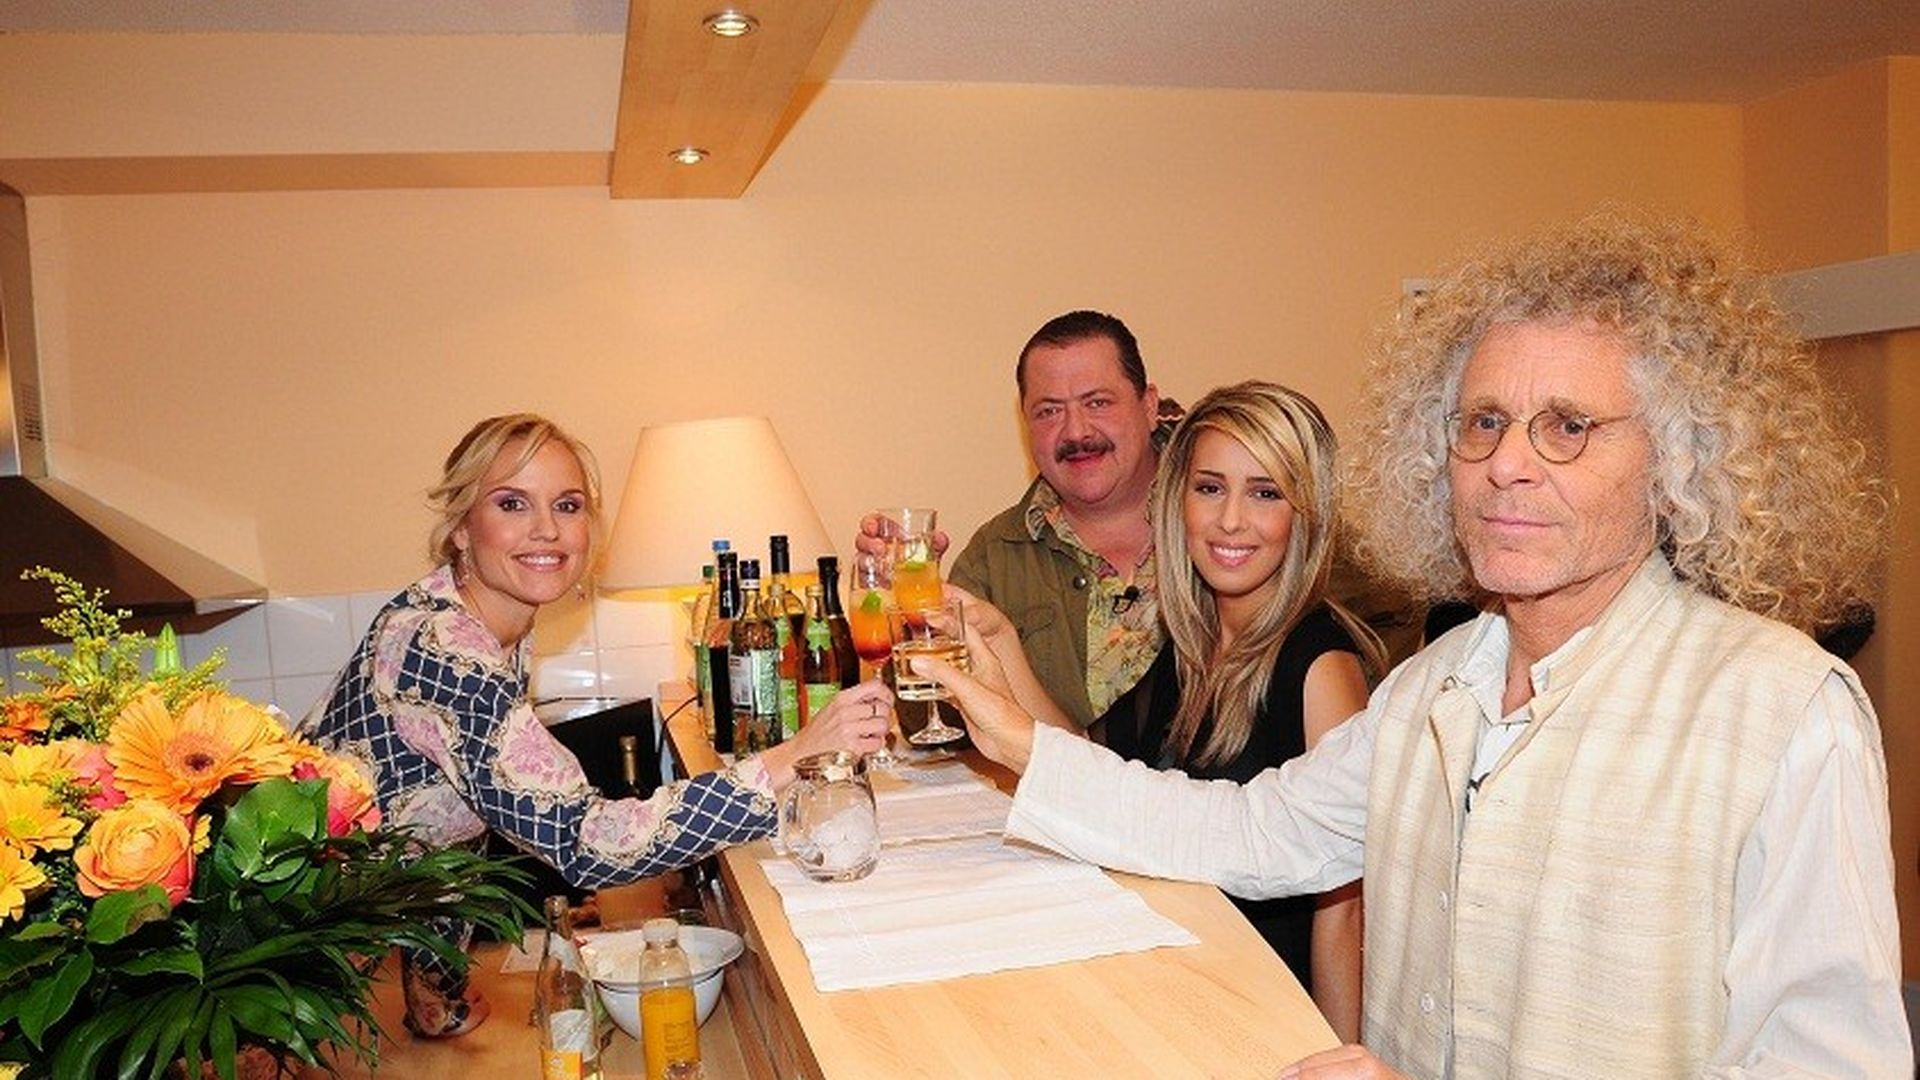 Promi Dinner Mit Popstars Gewinnerin Promiflashde